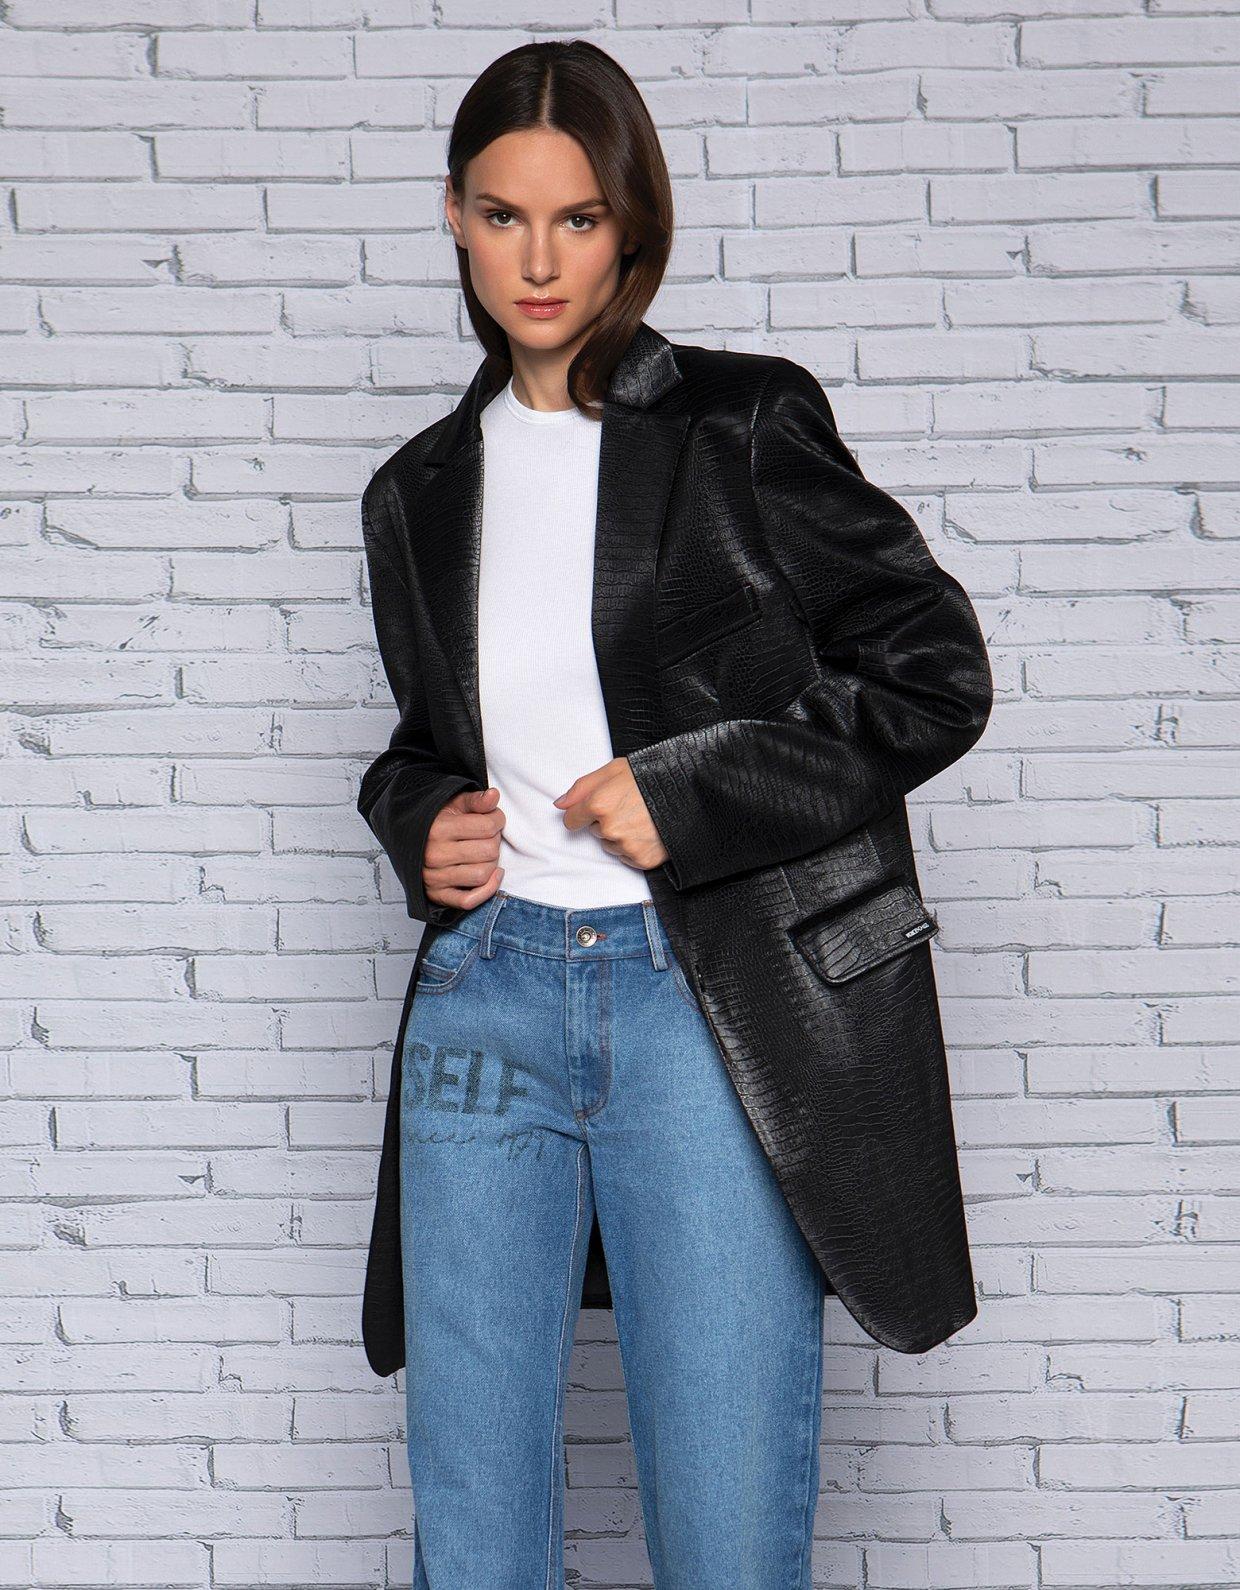 Peace & Chaos Street style eco leather blazer